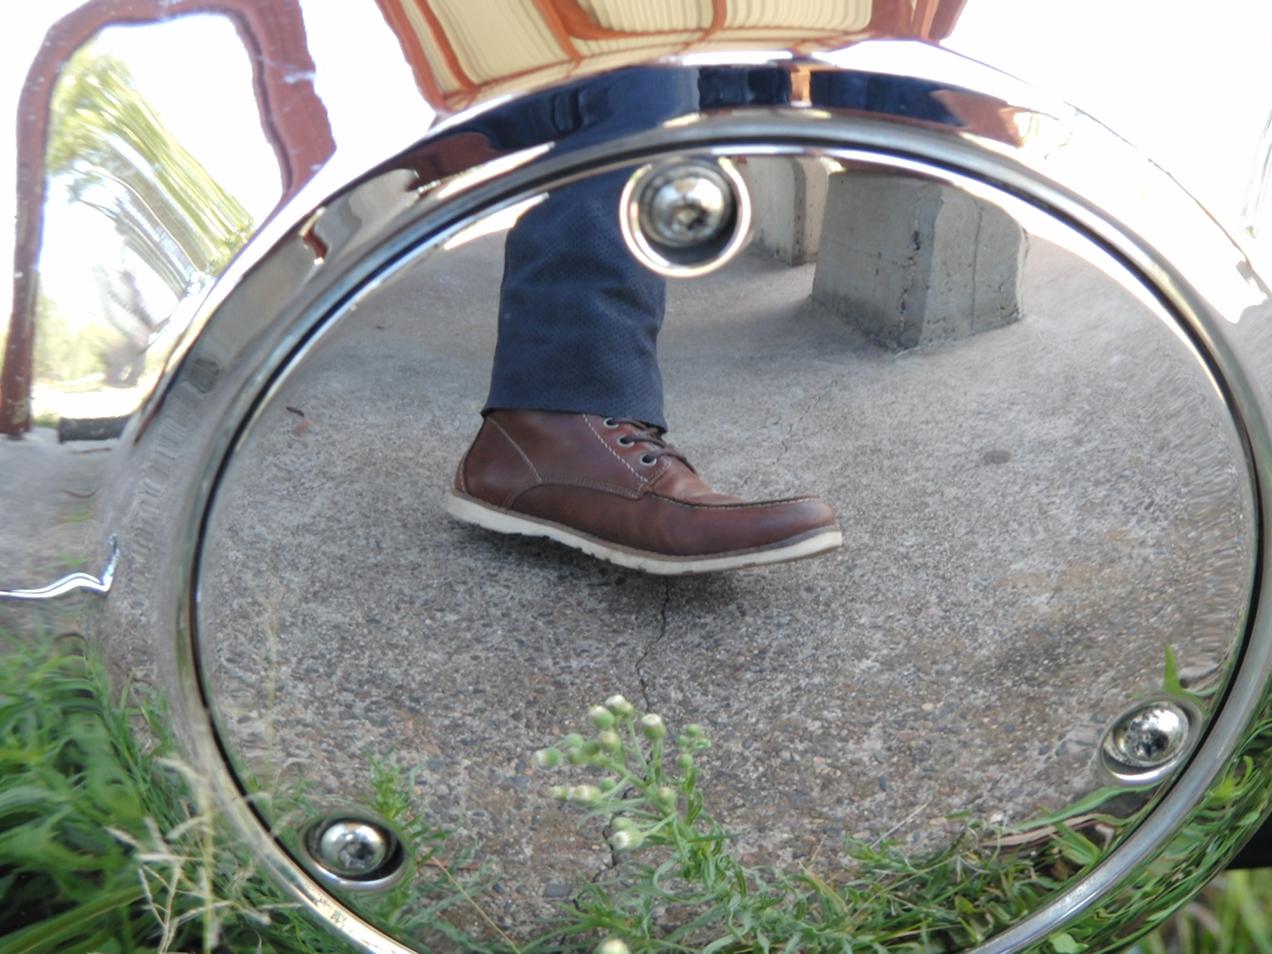 revit_mohawk_redwing_motorcycle_boots_steve_mcqueen_CIMG3125